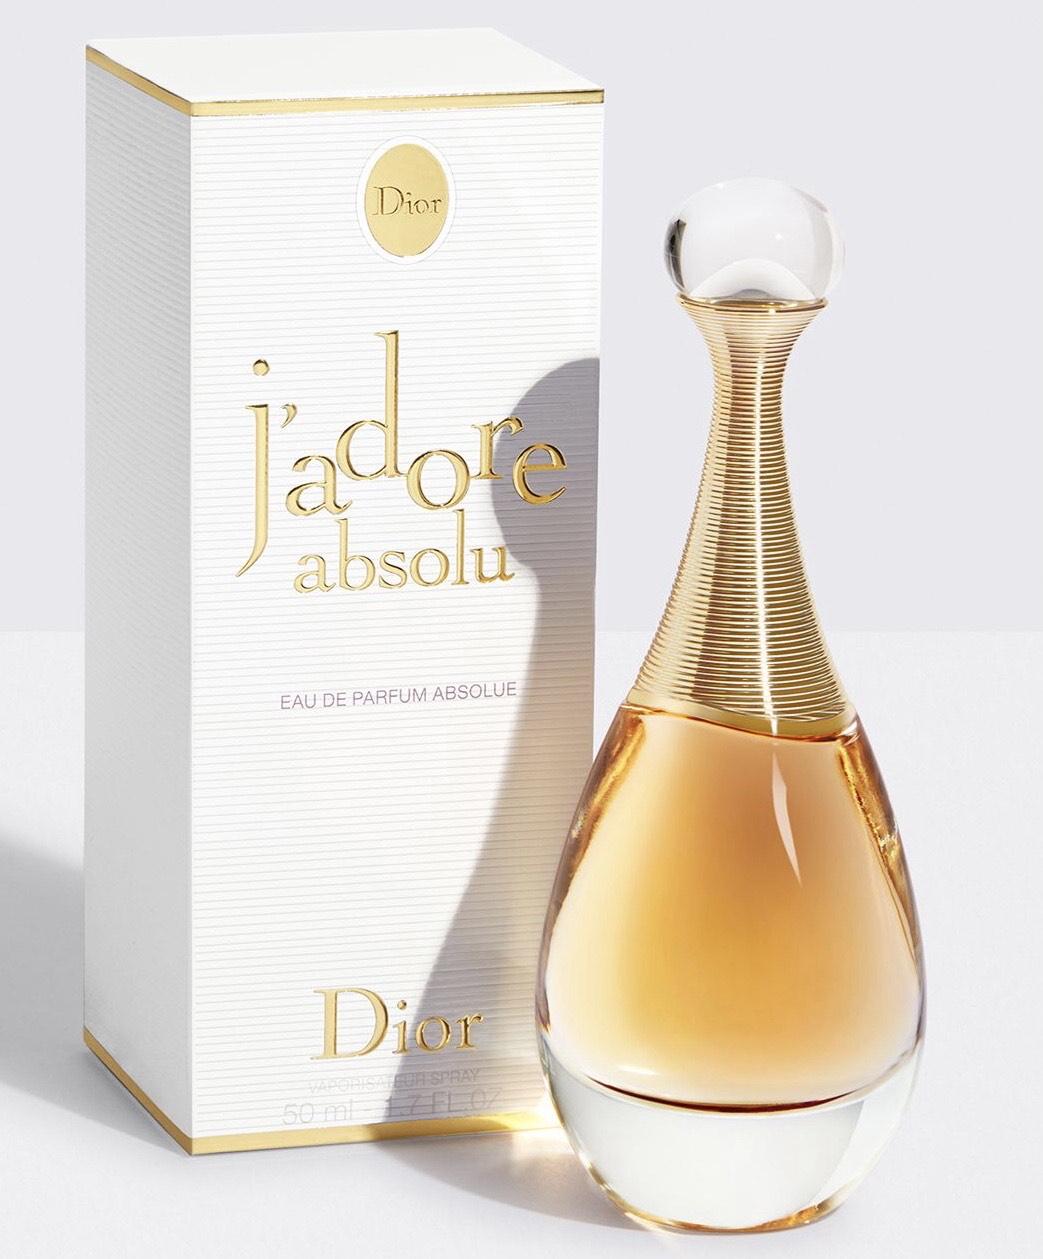 DIOR J'Adore L'Absolu Eau De Parfum 75ml Spray - £73.39 with code at Fragrance Shop